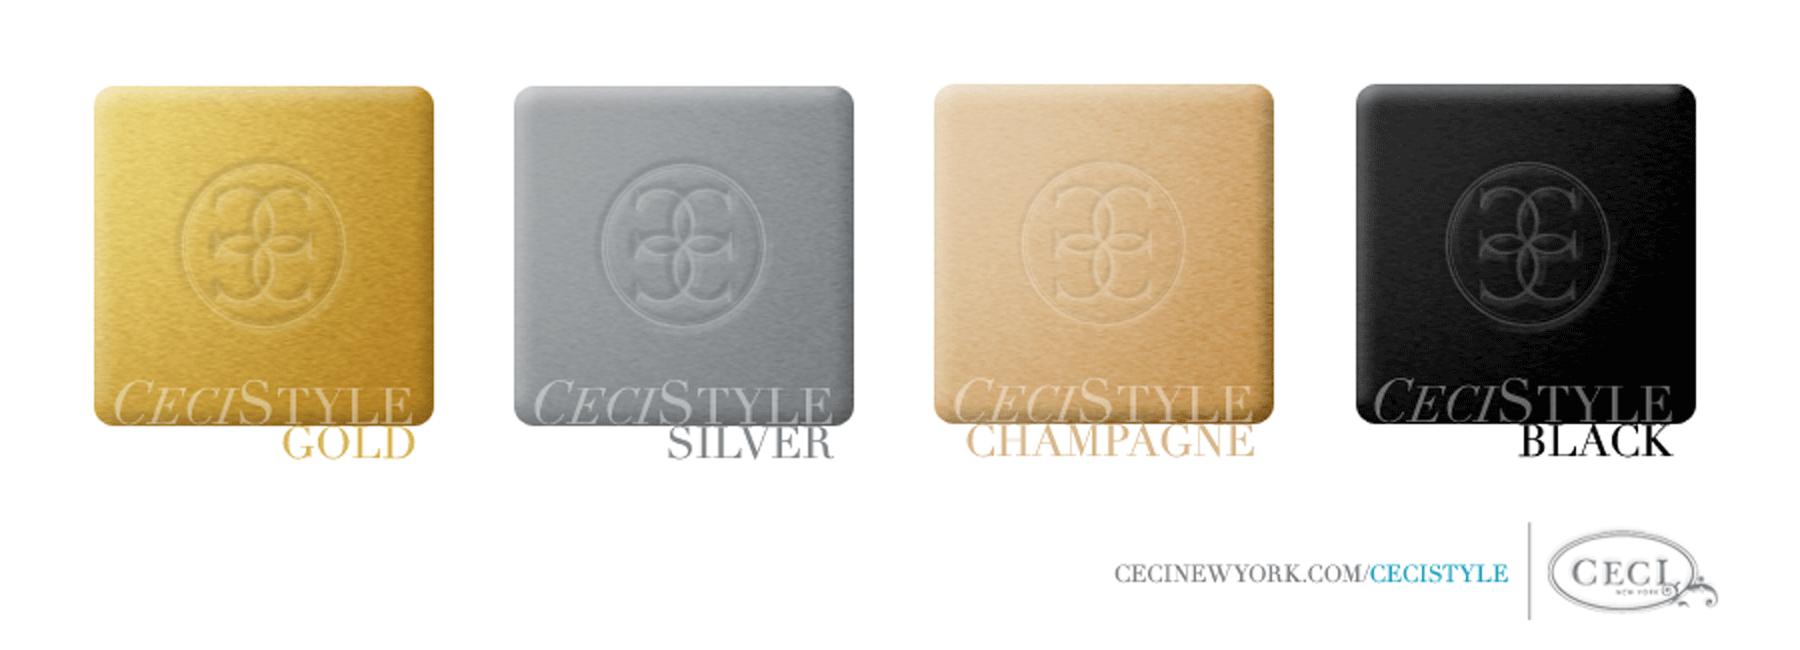 Ceci's Color Stories - Black, Gold & Silver Event Colors - color swatches, gold, silver, champagne, black, event